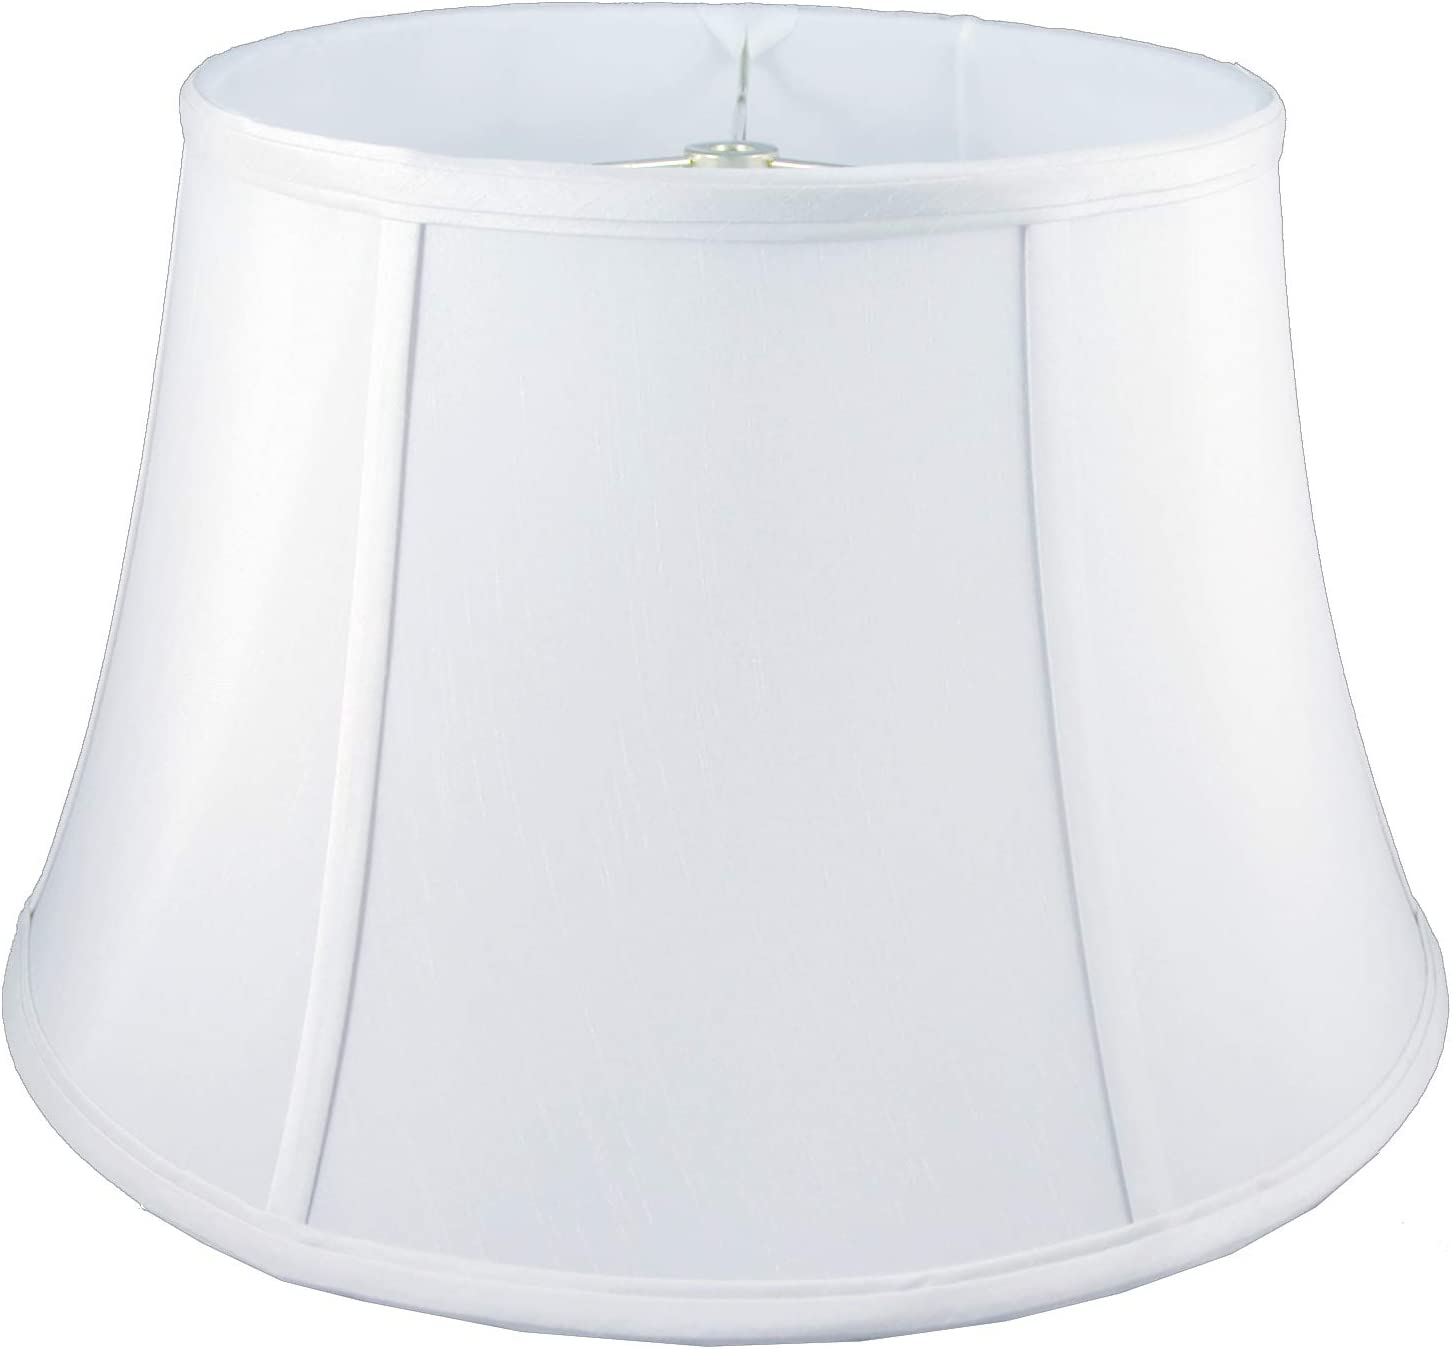 American Pride 11 x 18 x 9.75 Round Soft Shantung Tailored Lampshade, White